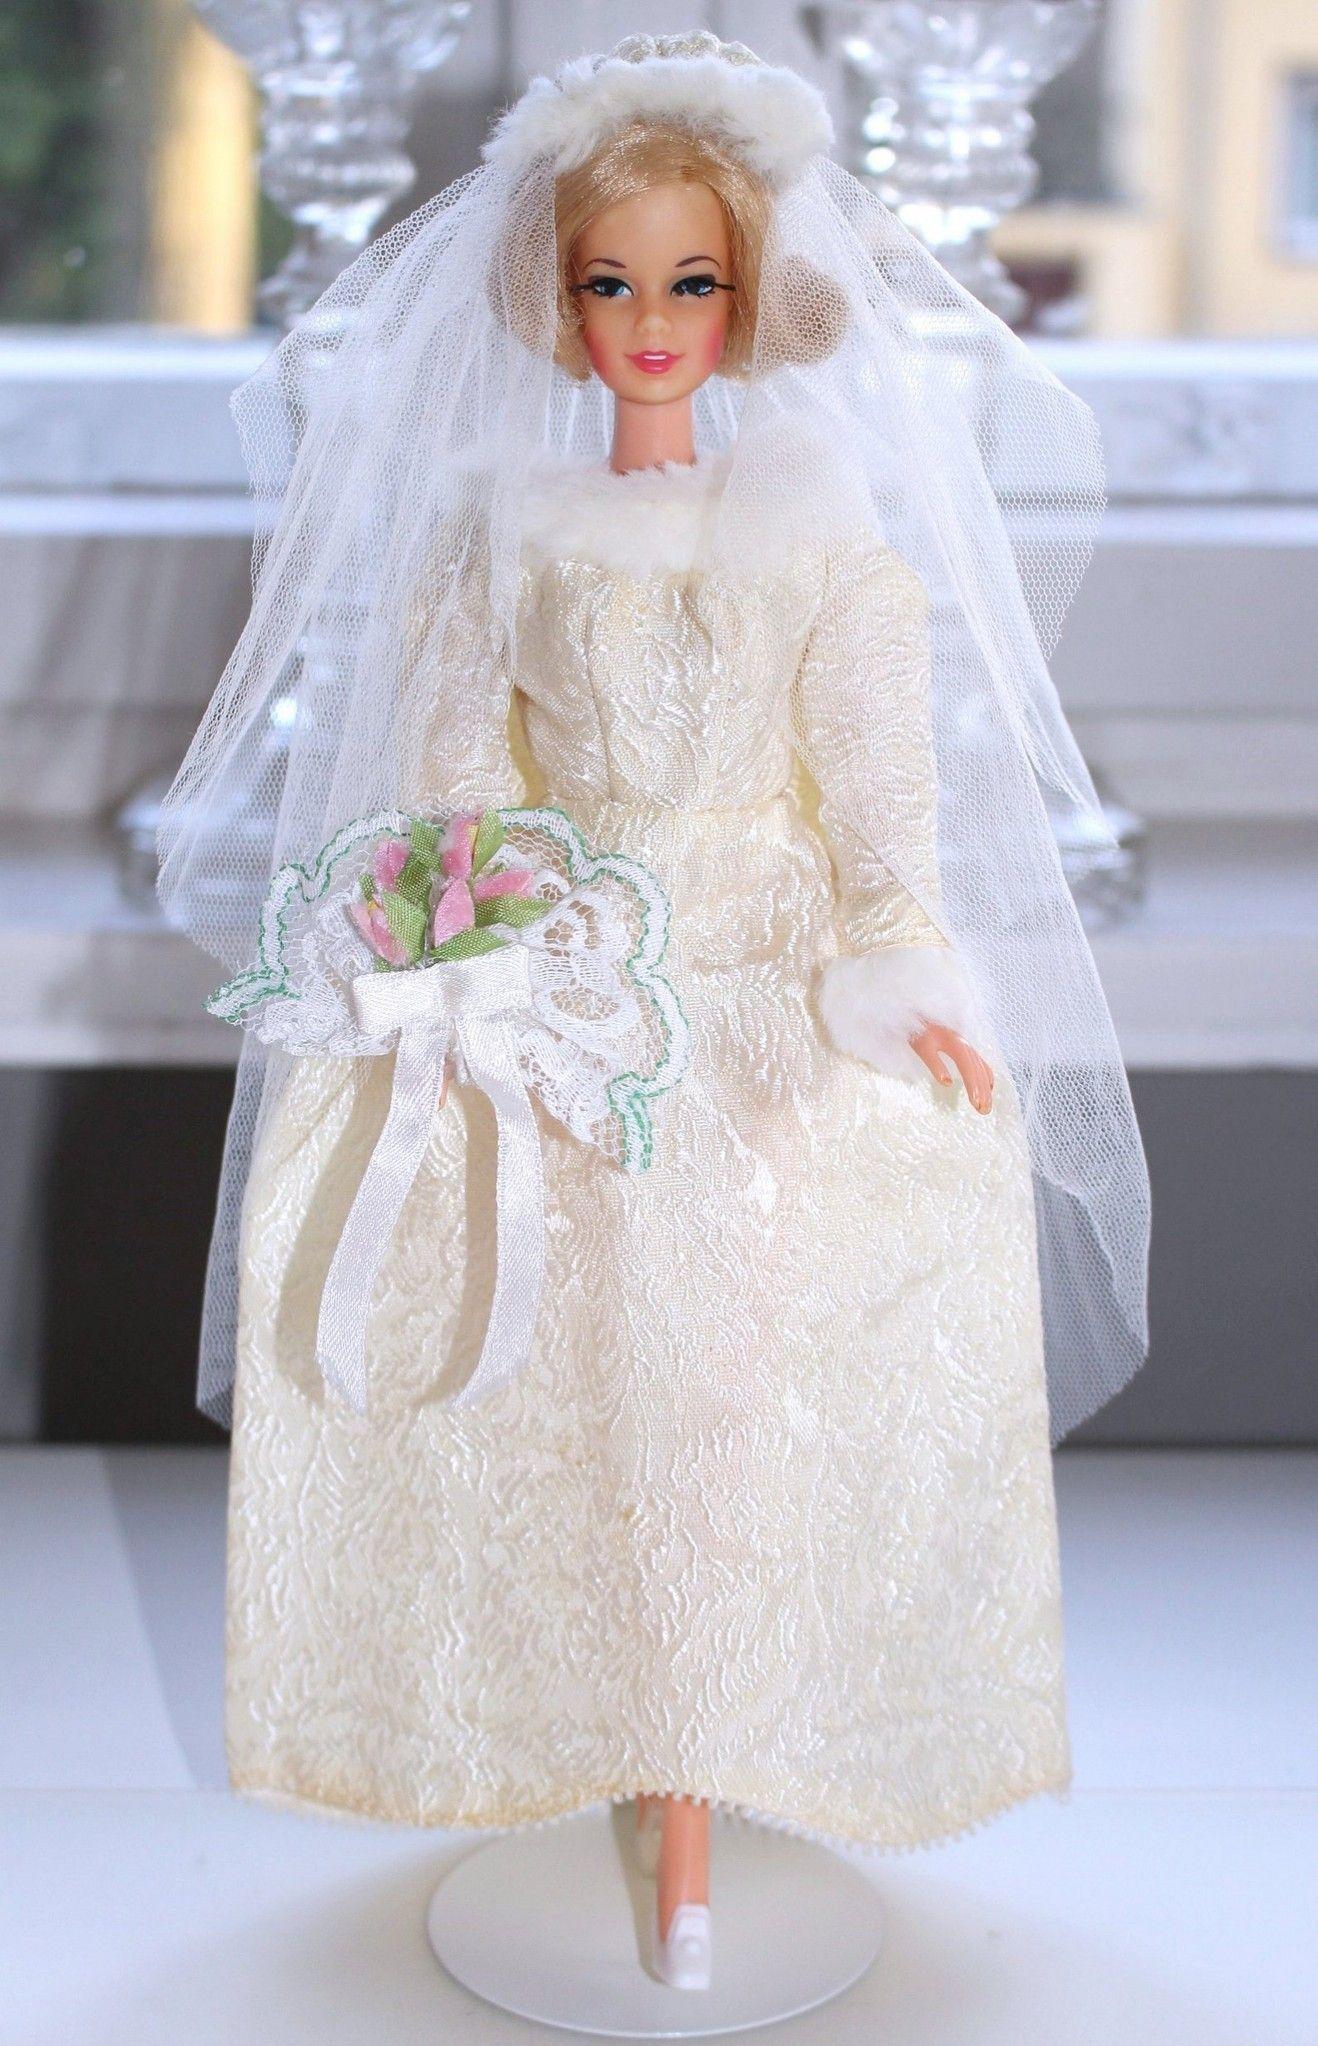 Short Flip Stacey in Winter Wedding both from 19  Vintage